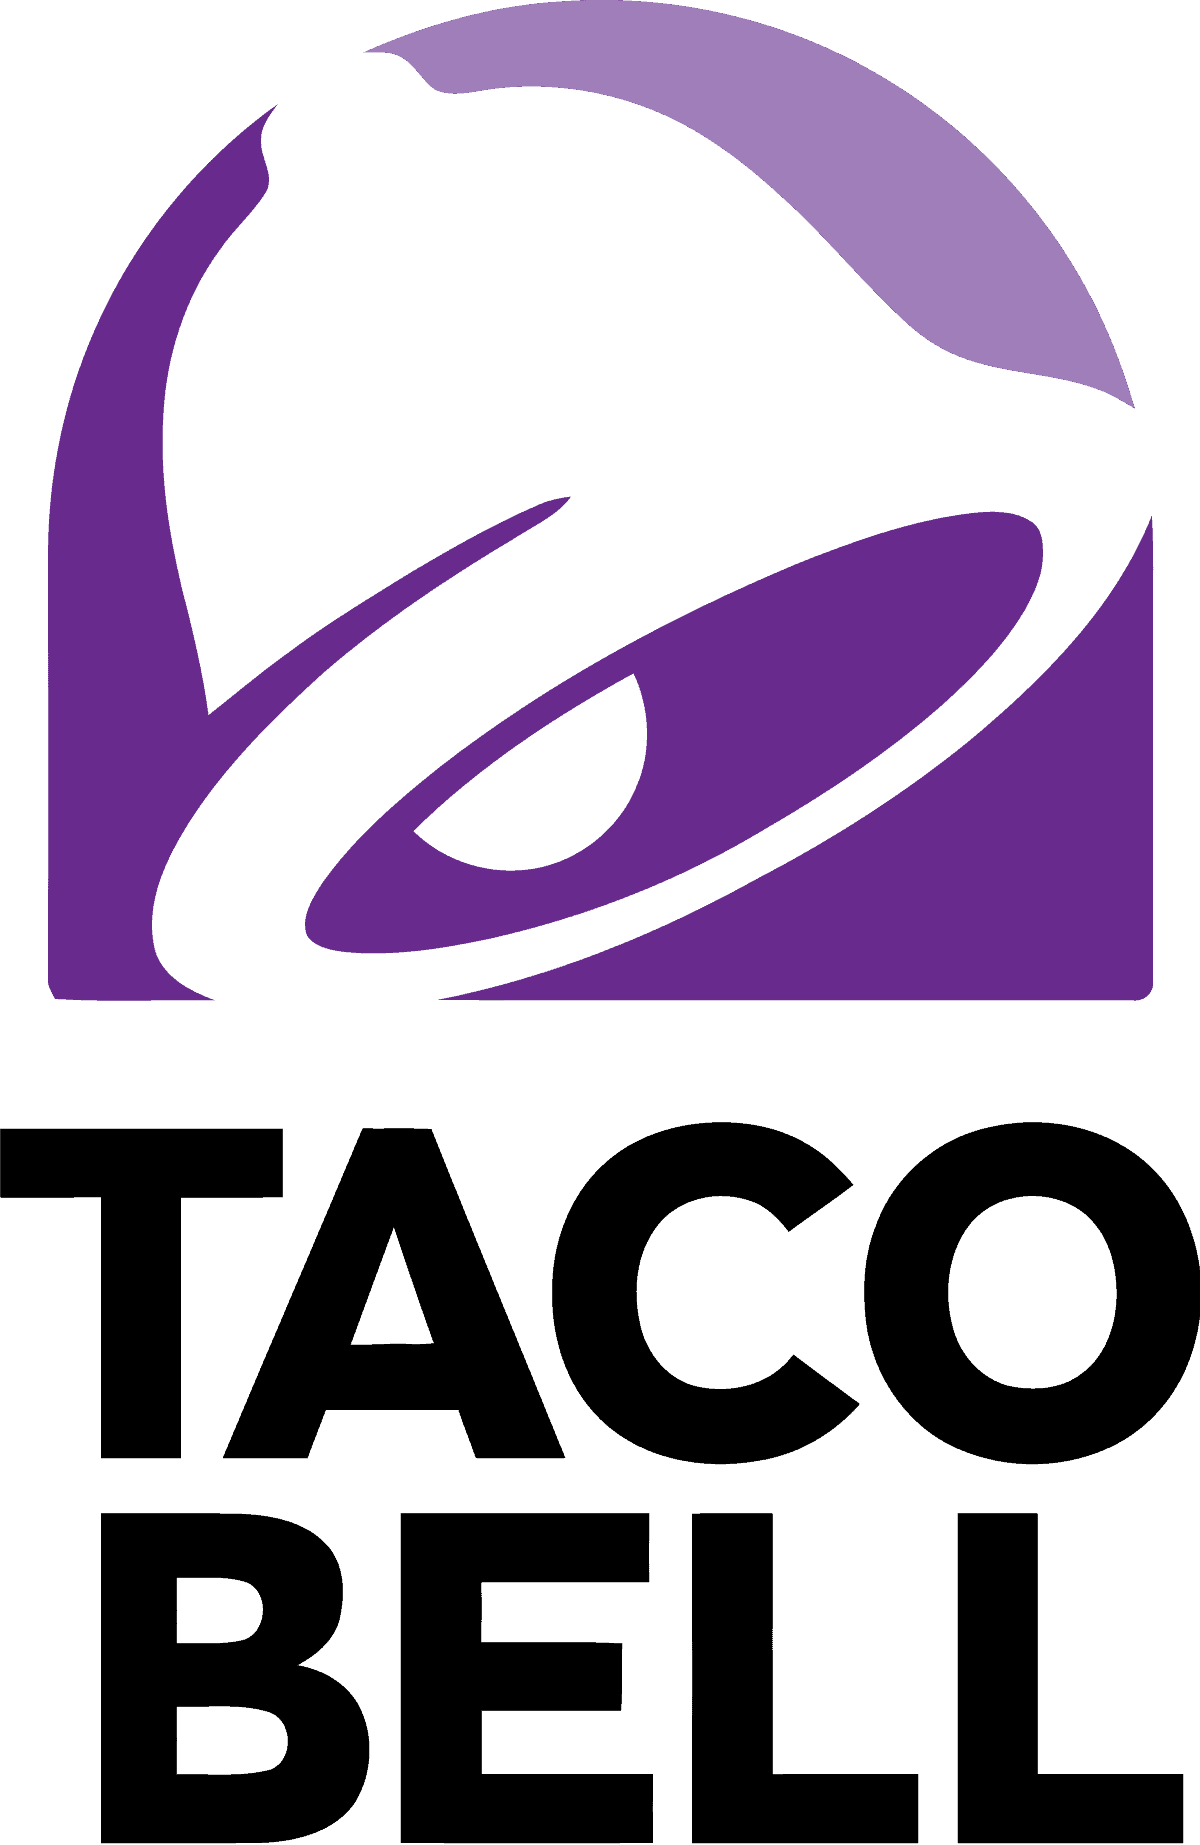 Taco Bell Student Discounts logo